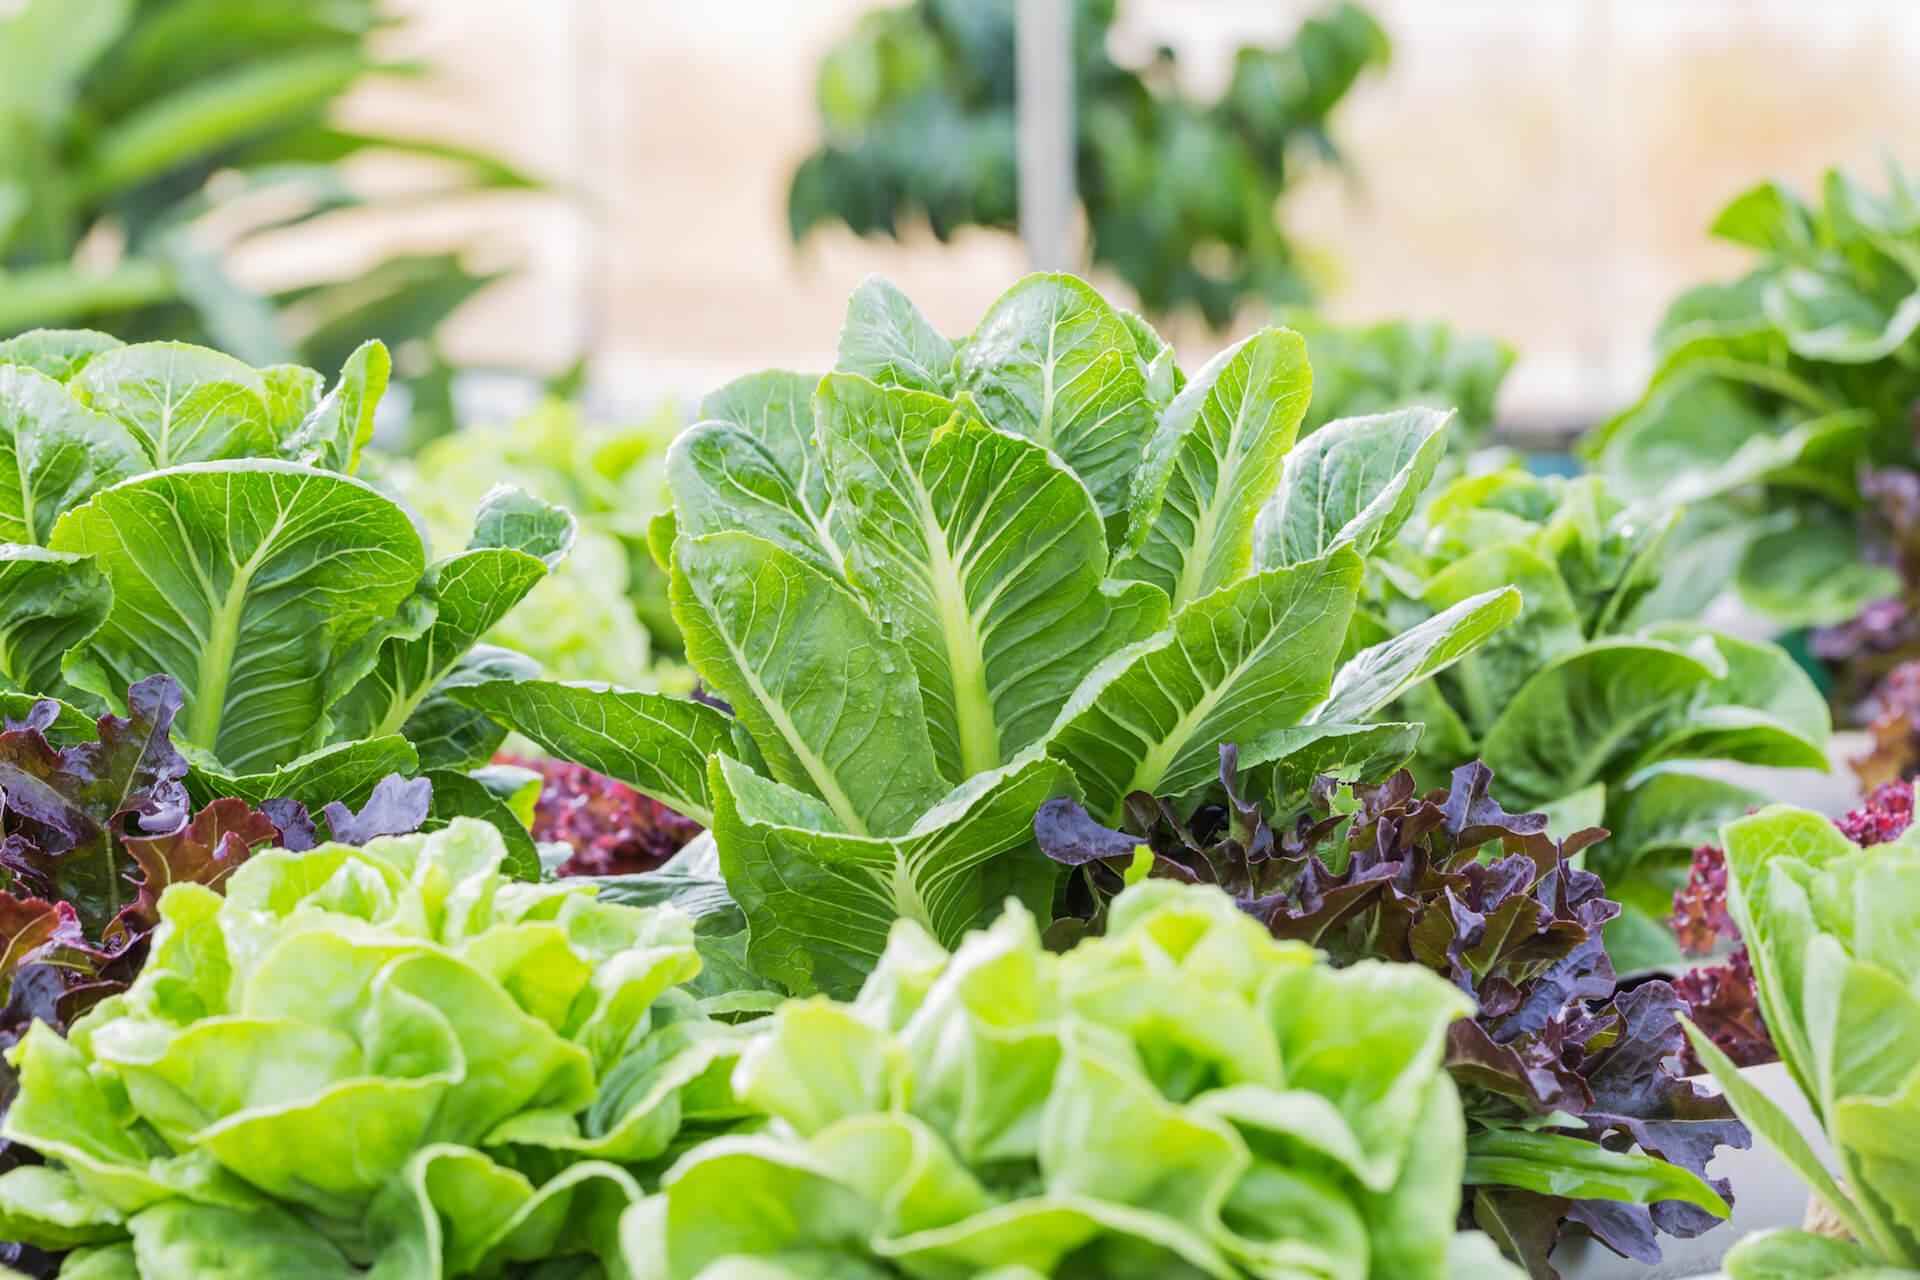 Growing lettuce in a vegetable garden.